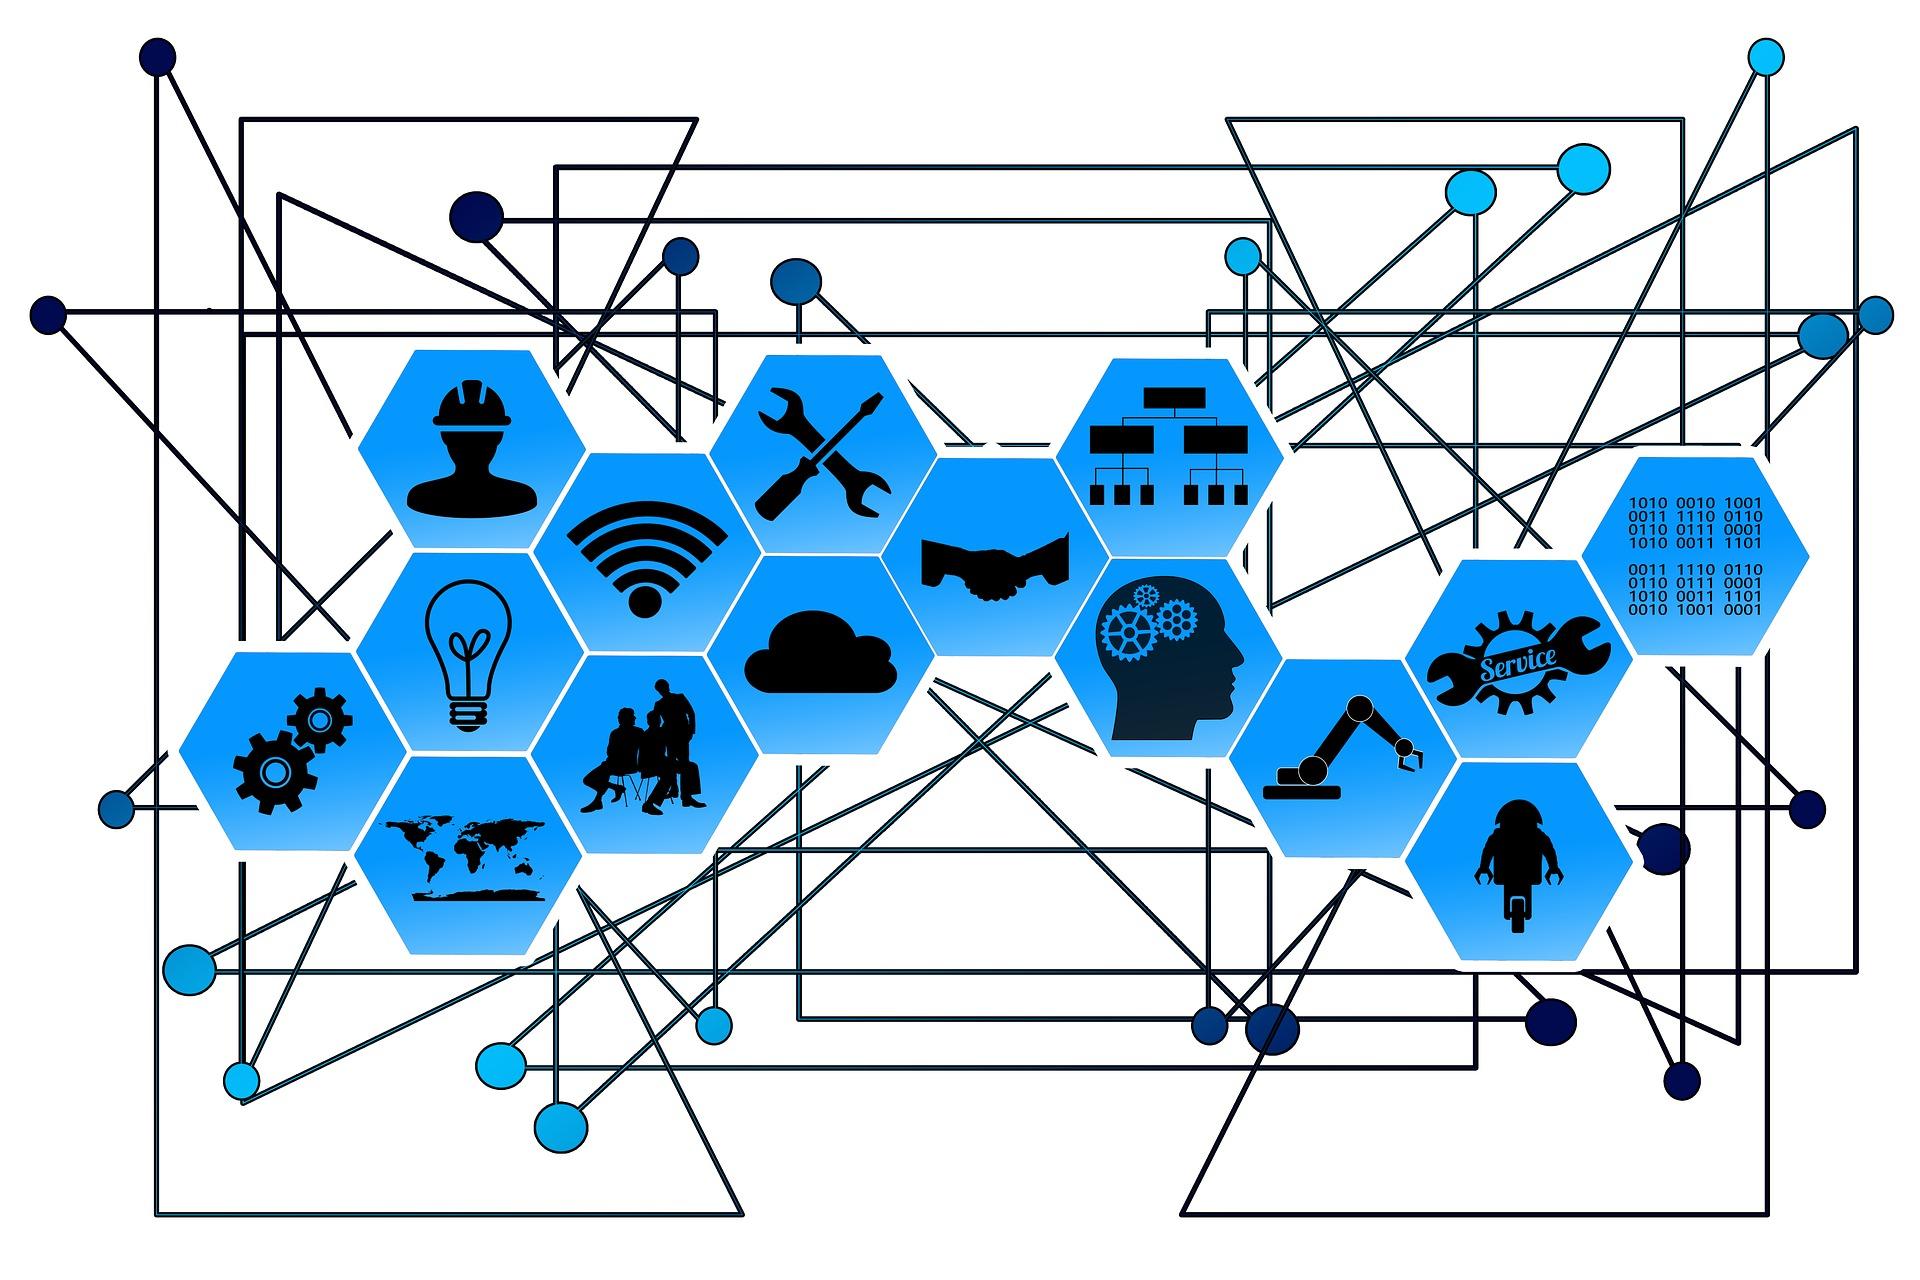 neurochain intelligent bots extract information